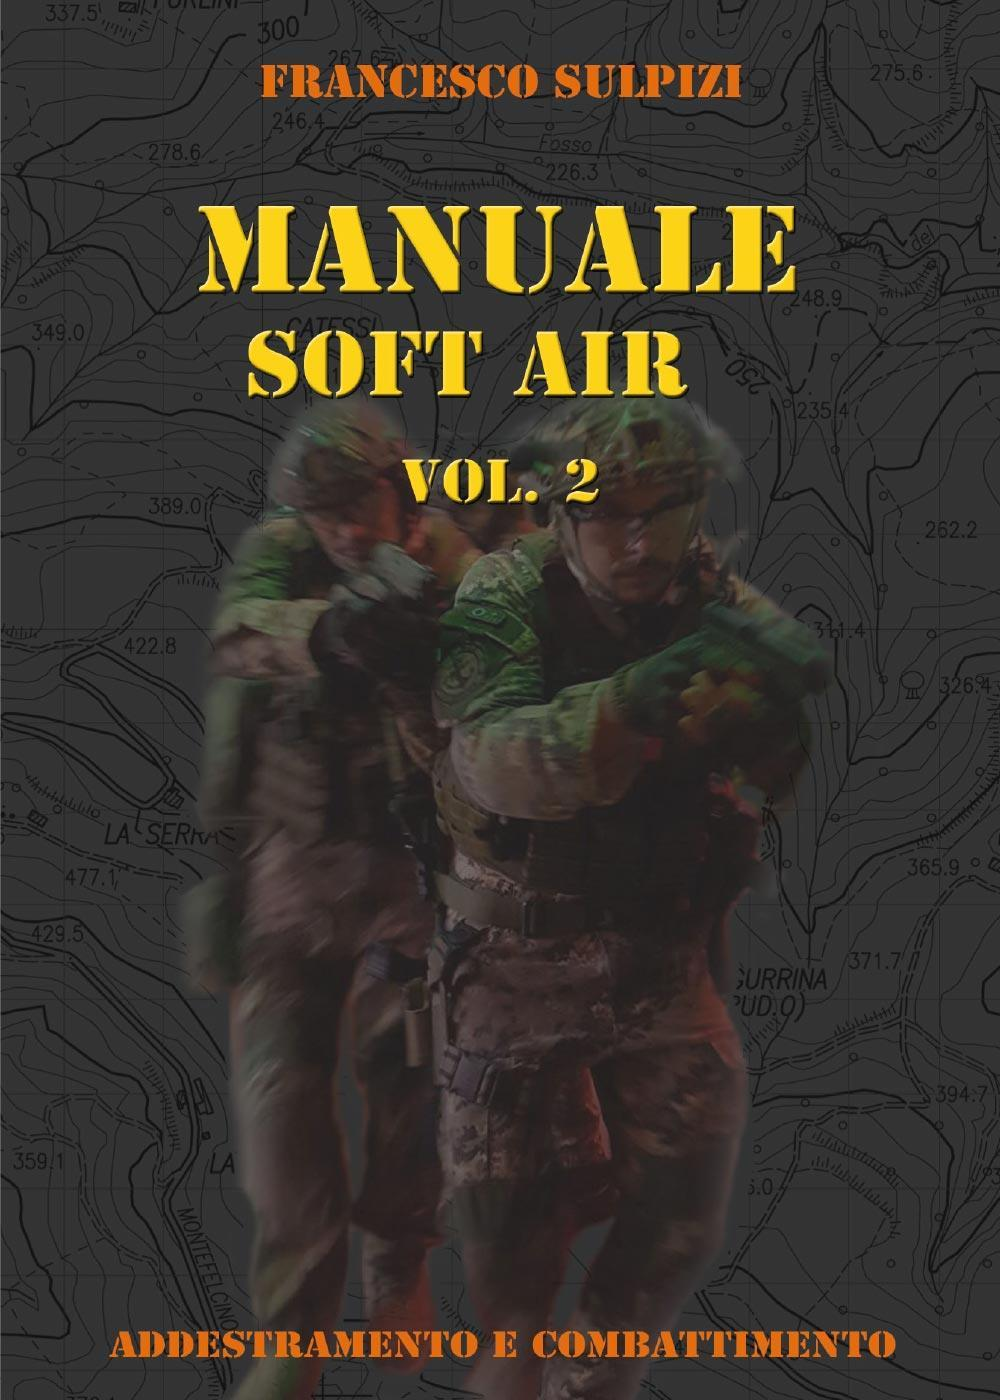 Manuale soft air vol. 2